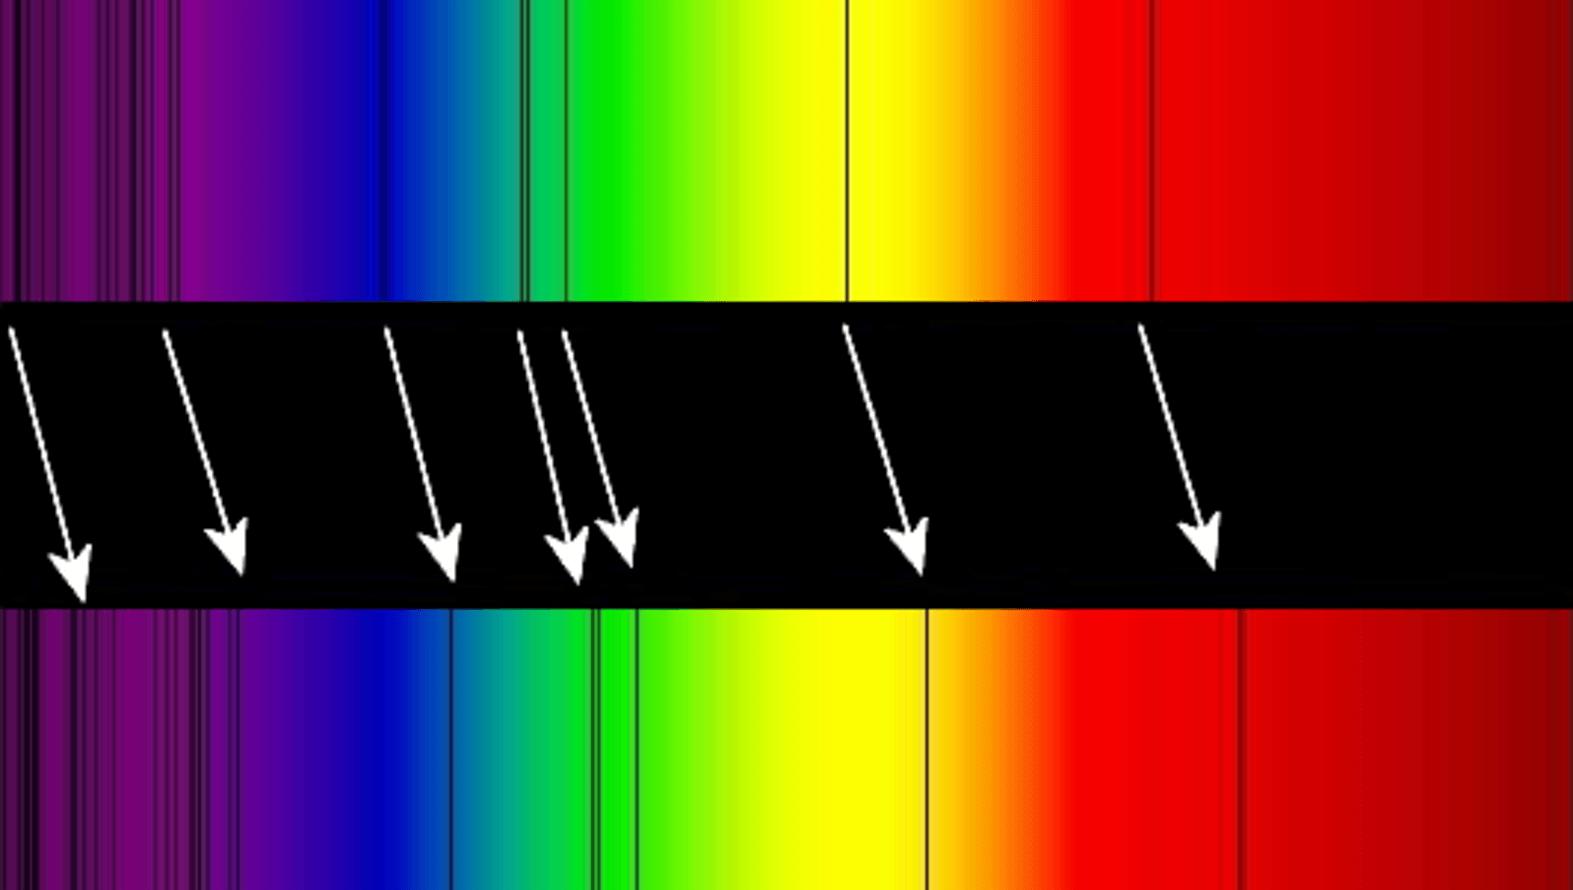 34   Cool Helium Absorption for Helium Absorption Spectrum  131fsj